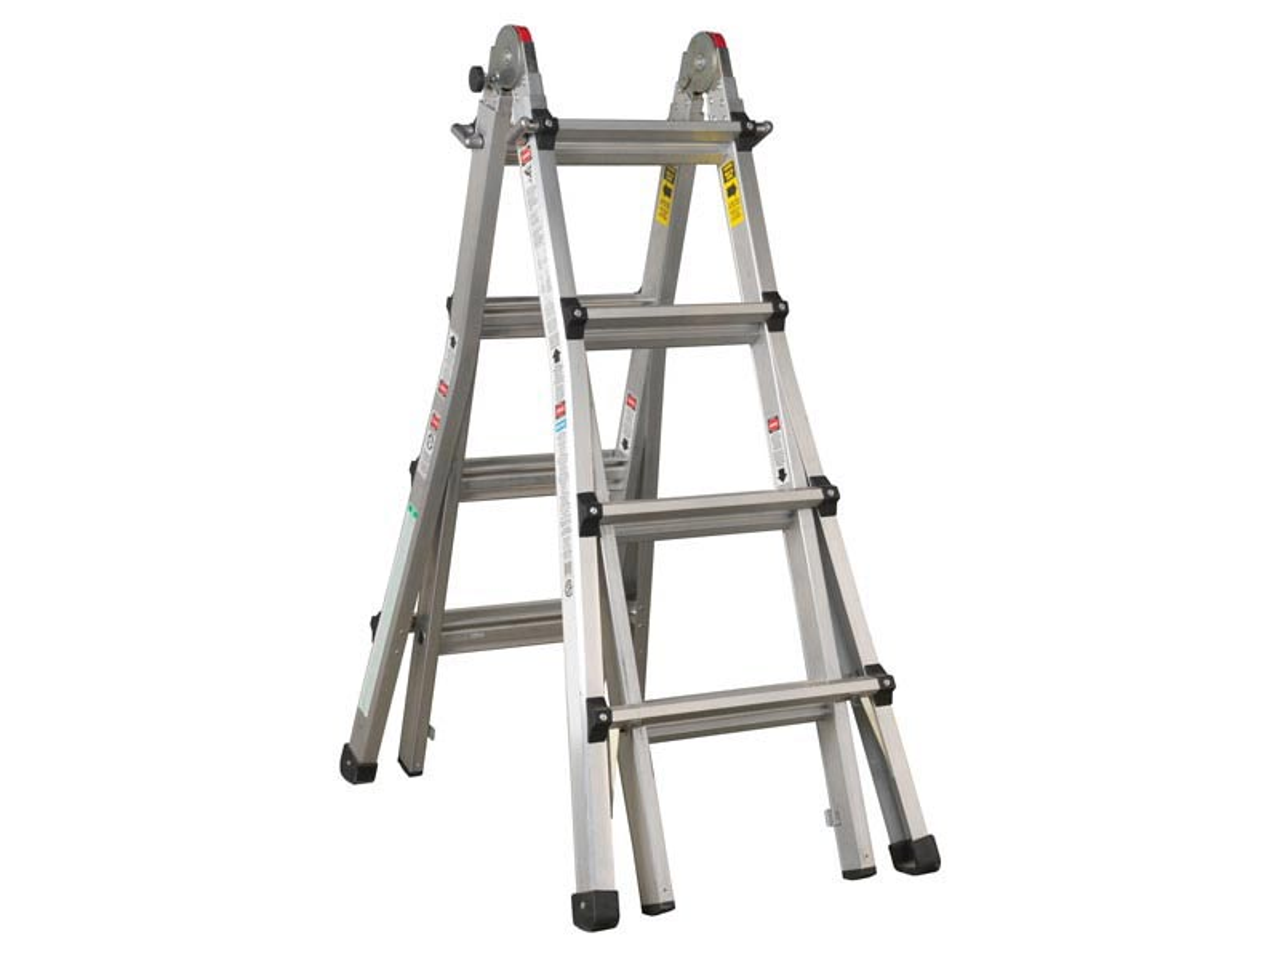 Midland Extendable Aluminum Ladders : Sealey afpl aluminium telescopic ladder way en